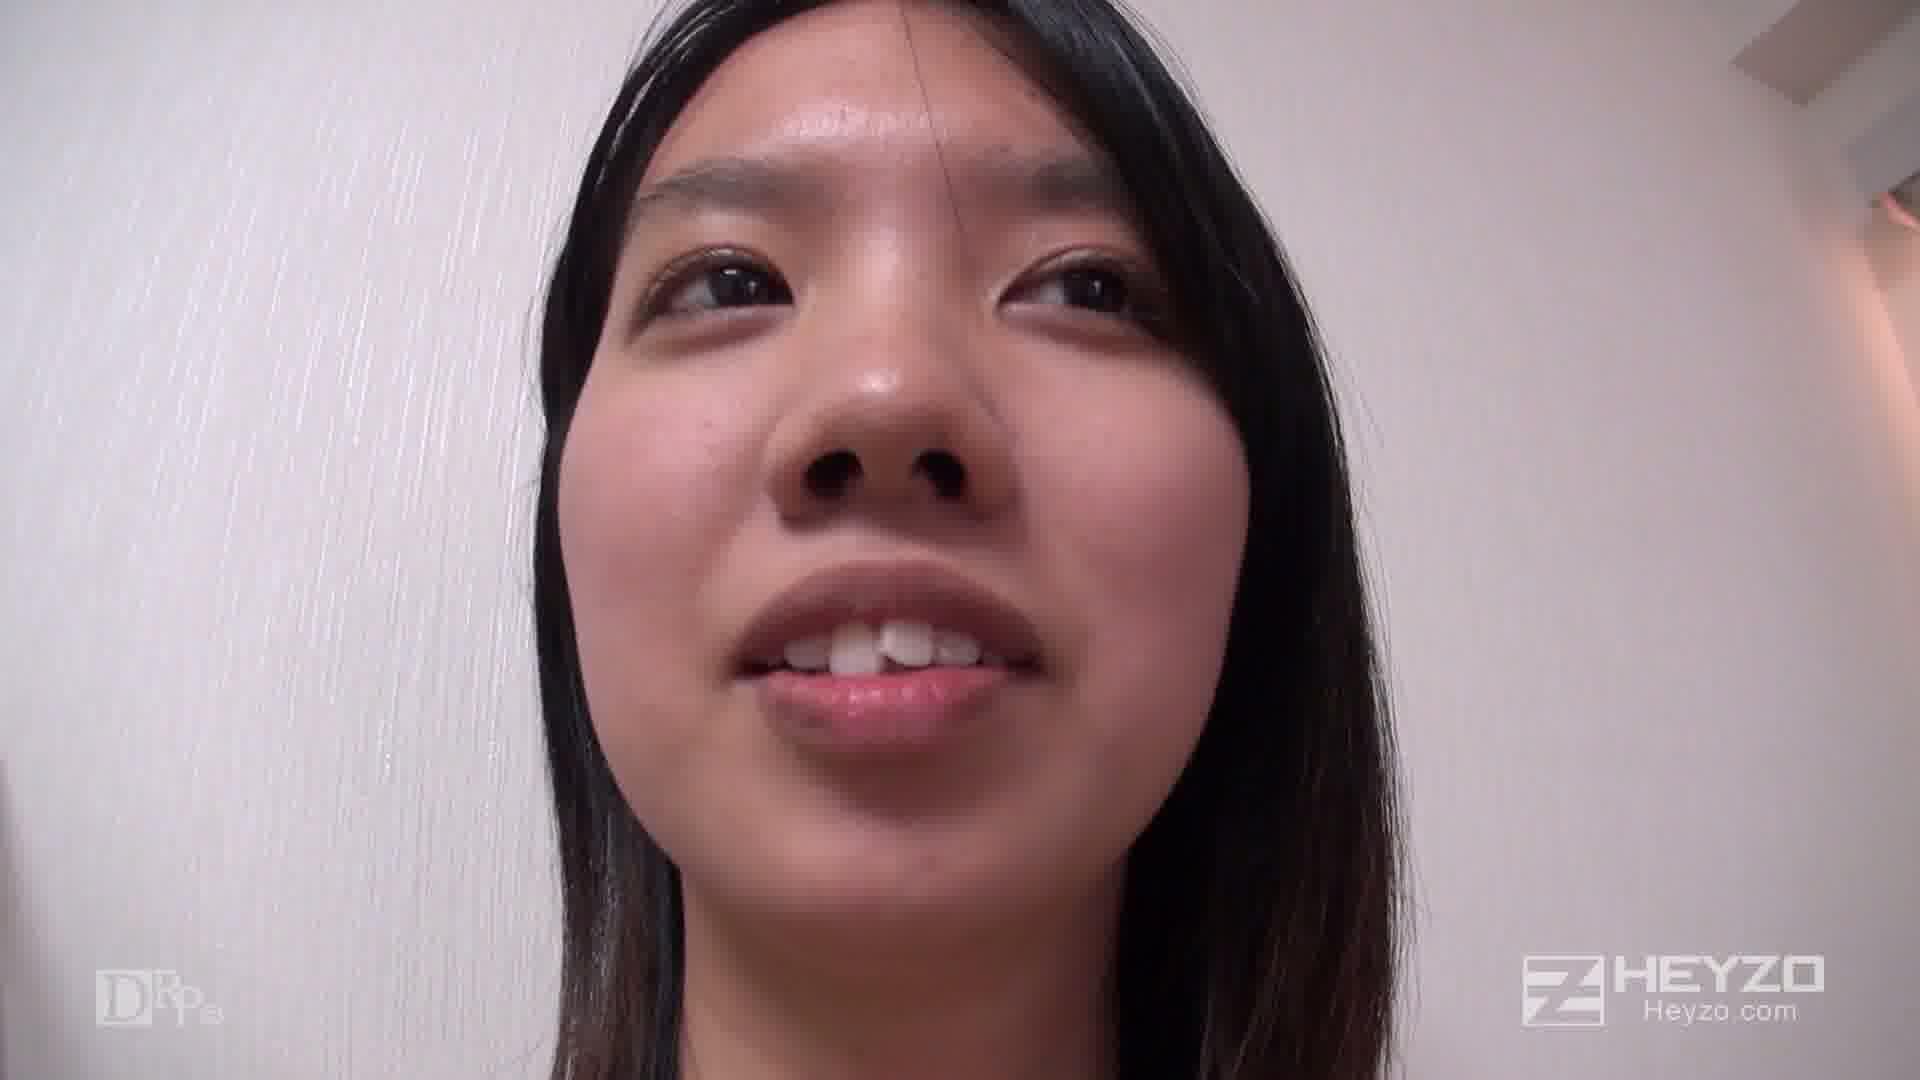 HAMEZO~ハメ撮りコレクション~vol.24 - 戸田夏希【脱衣 オナニー】